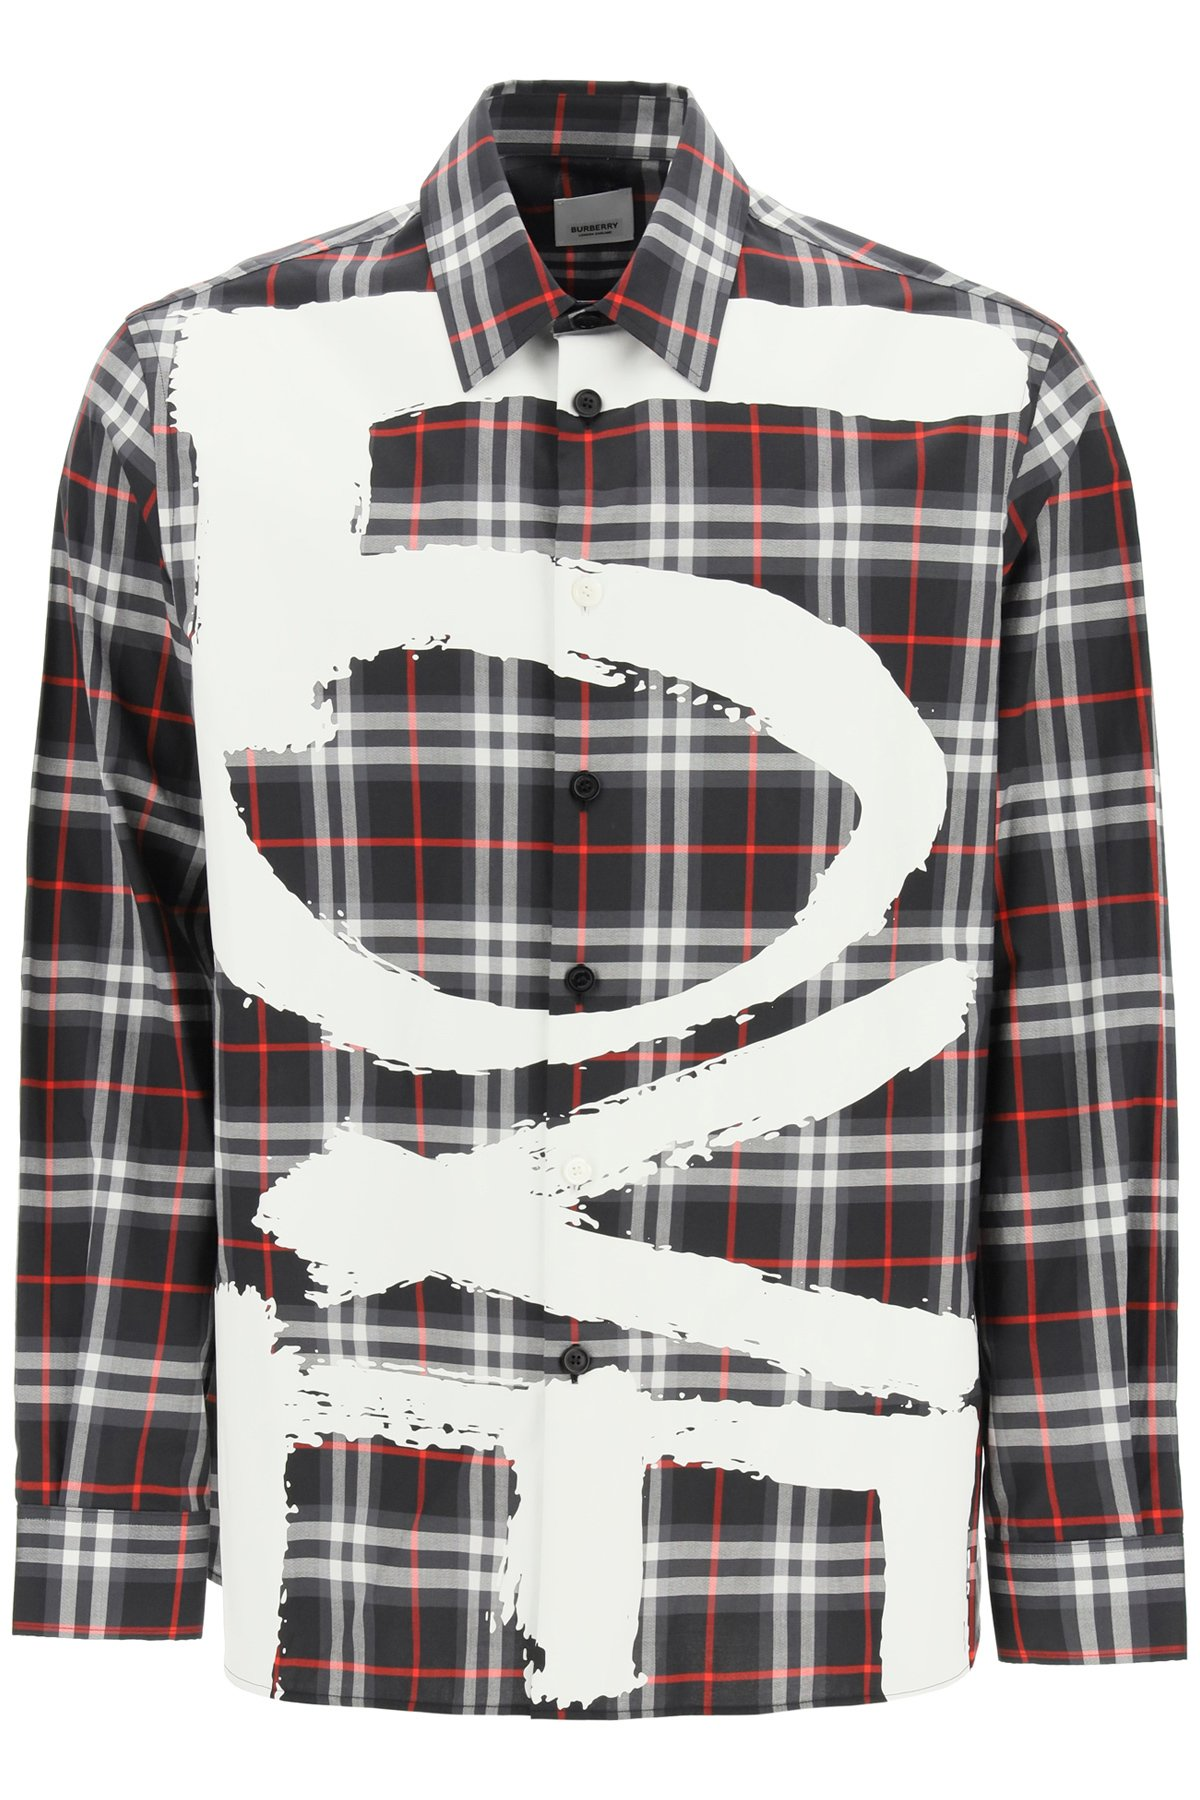 Burberry tavington vintage check shirt love print